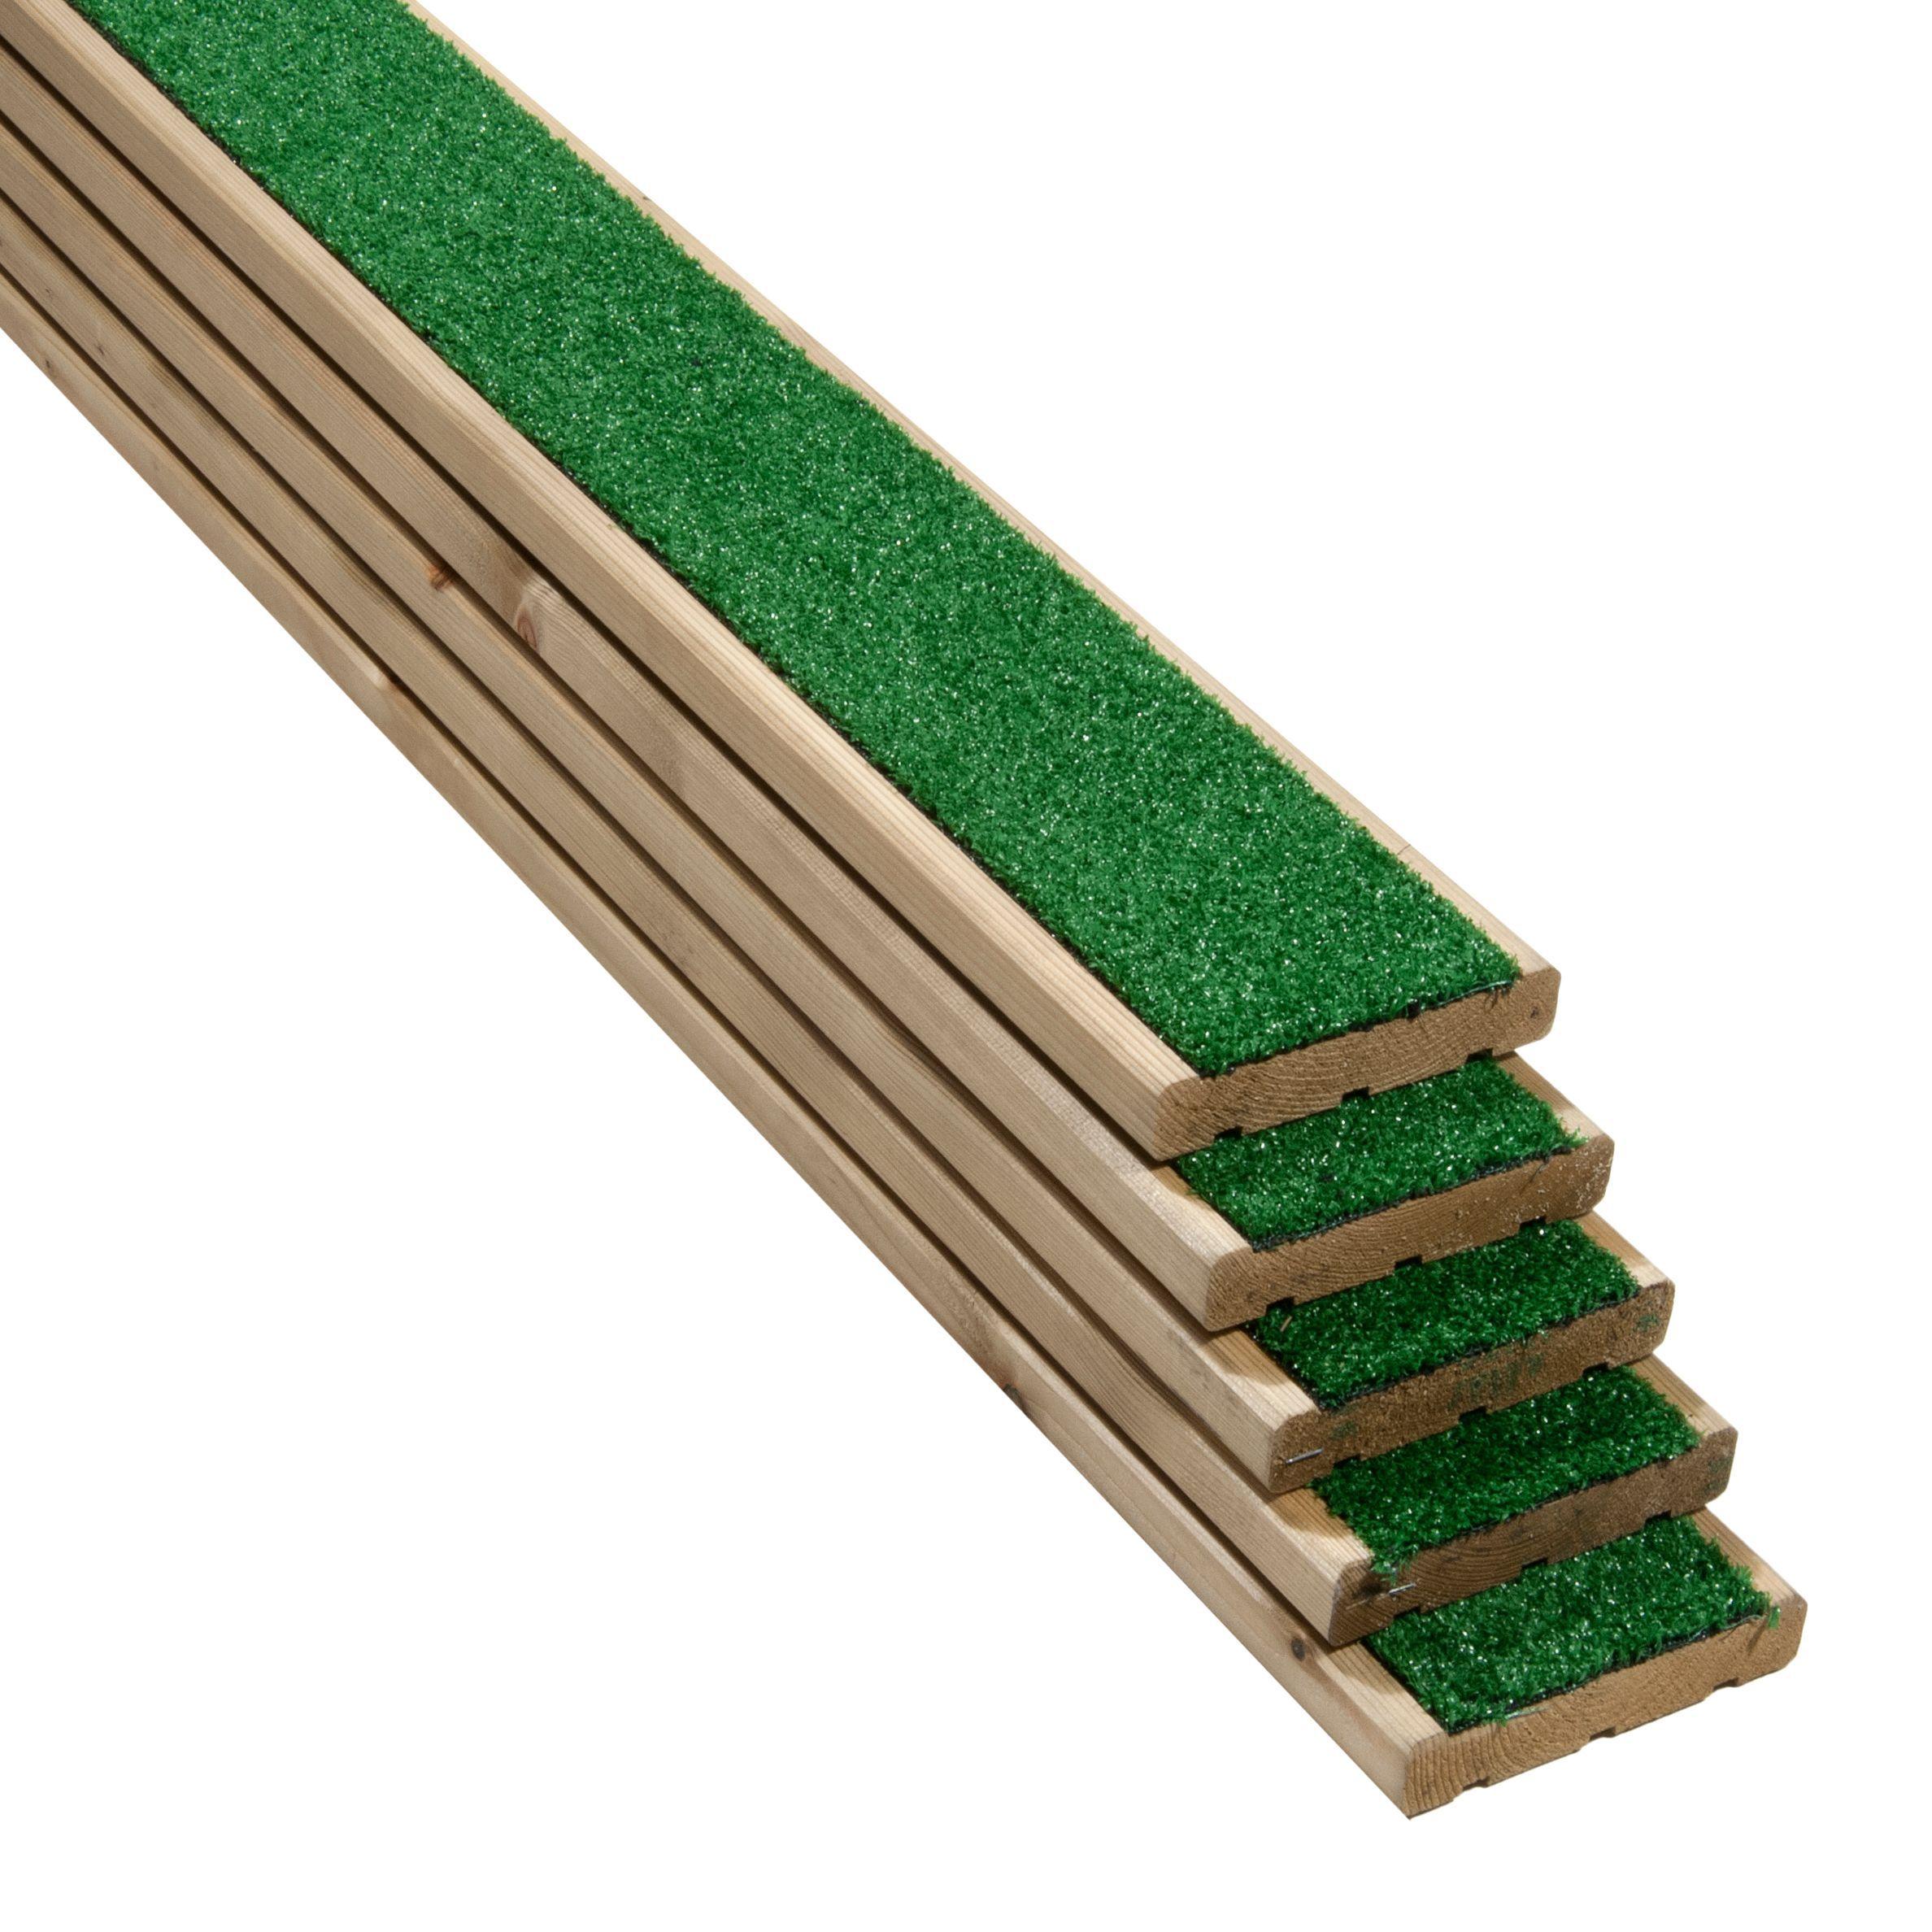 B Q Tile Cutter: Grassedeck Softwood Deck Board (T)28mm (W)144mm (L)2100mm